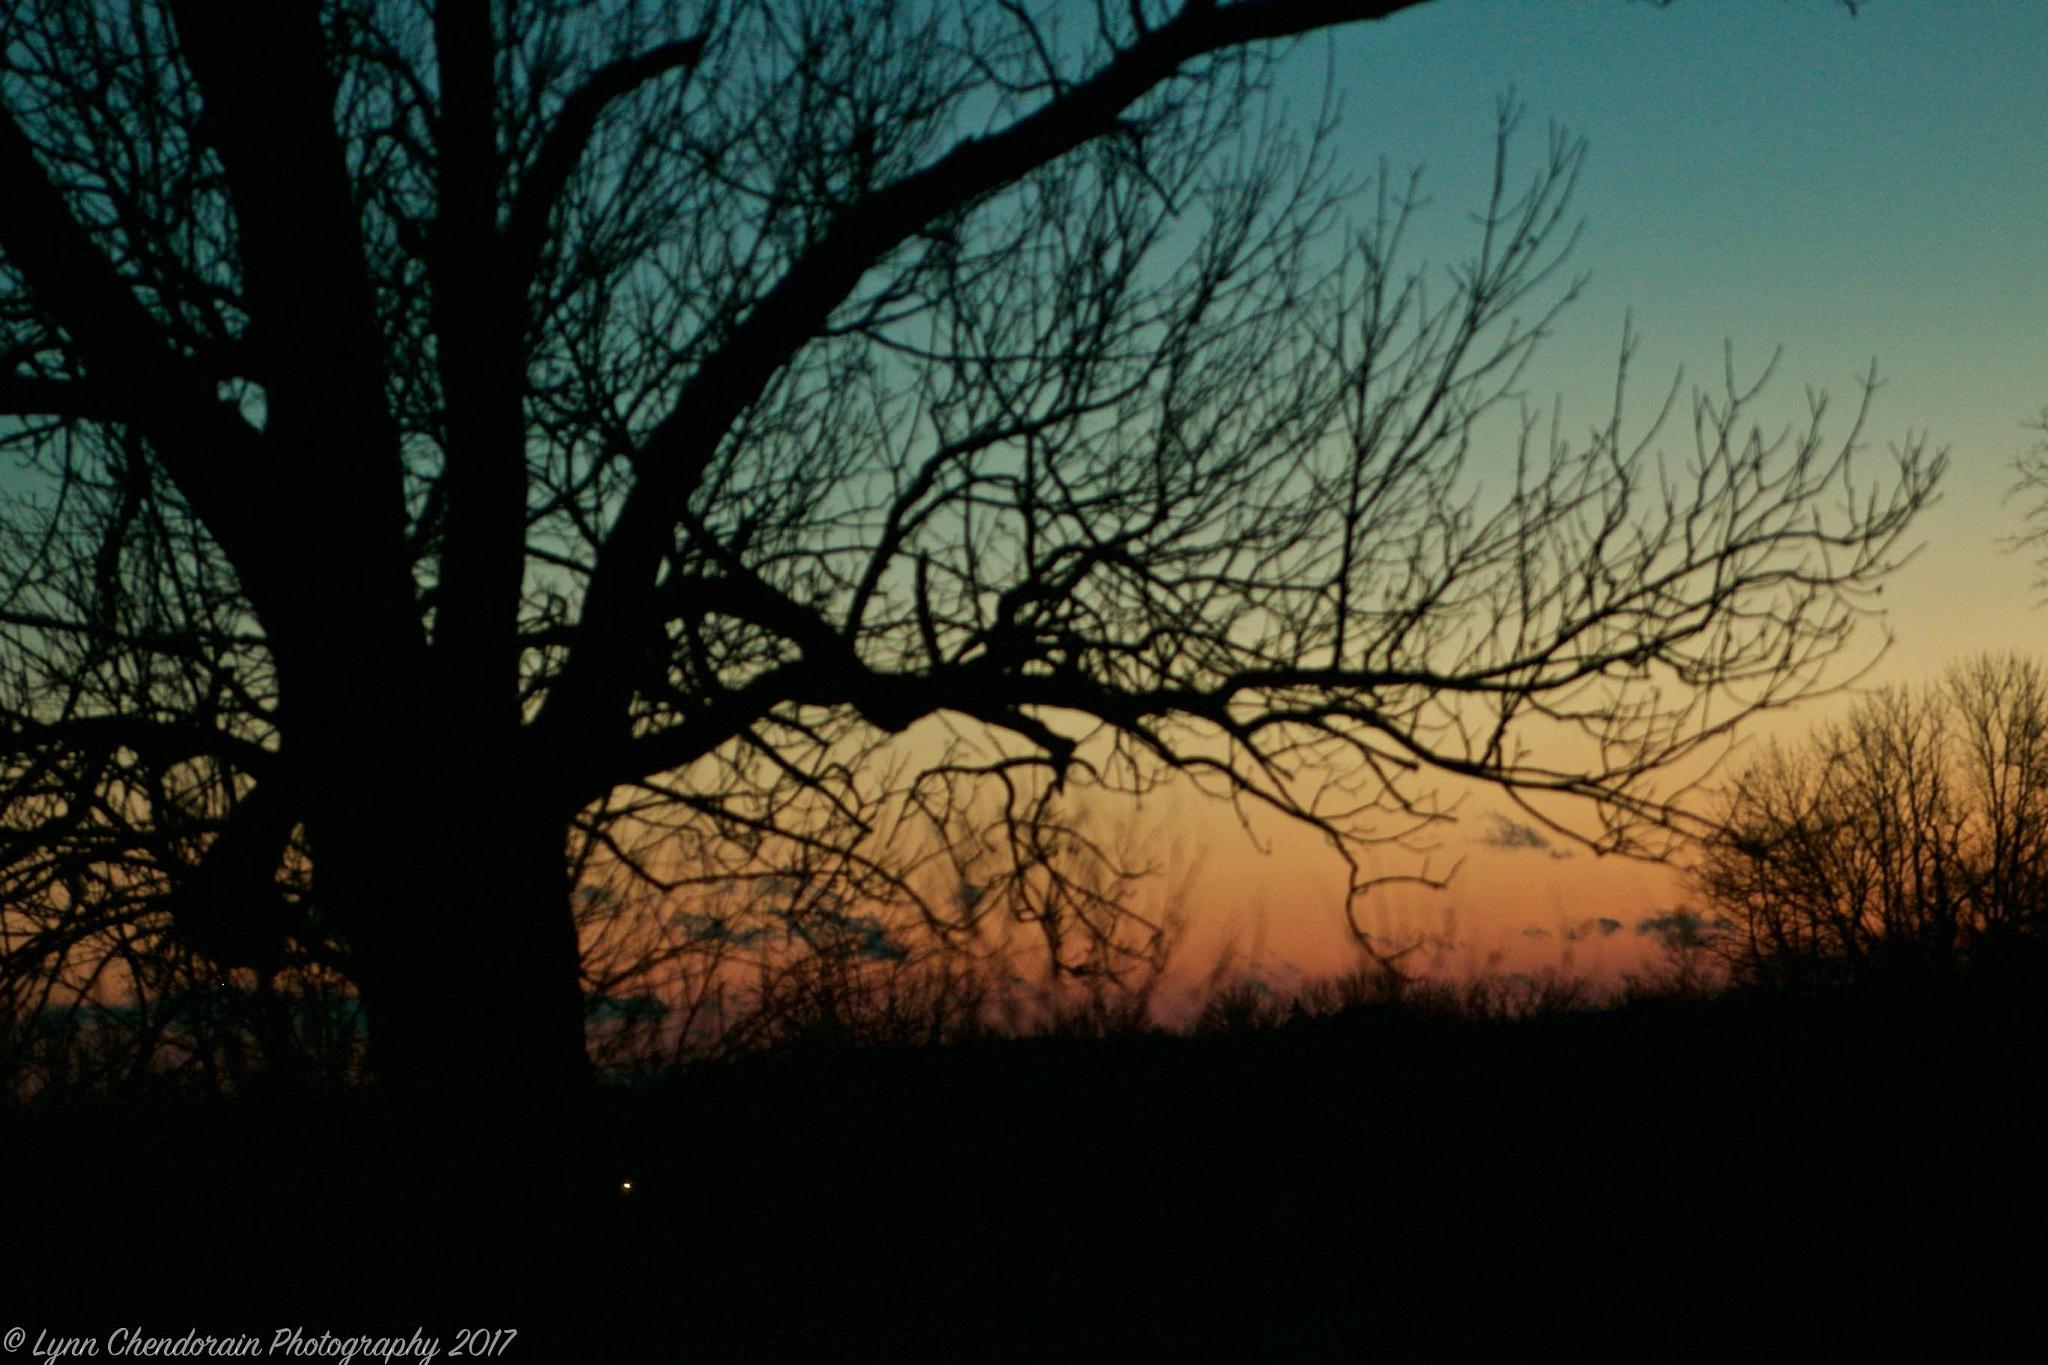 Tree Silhouette by Lynn Chendorain